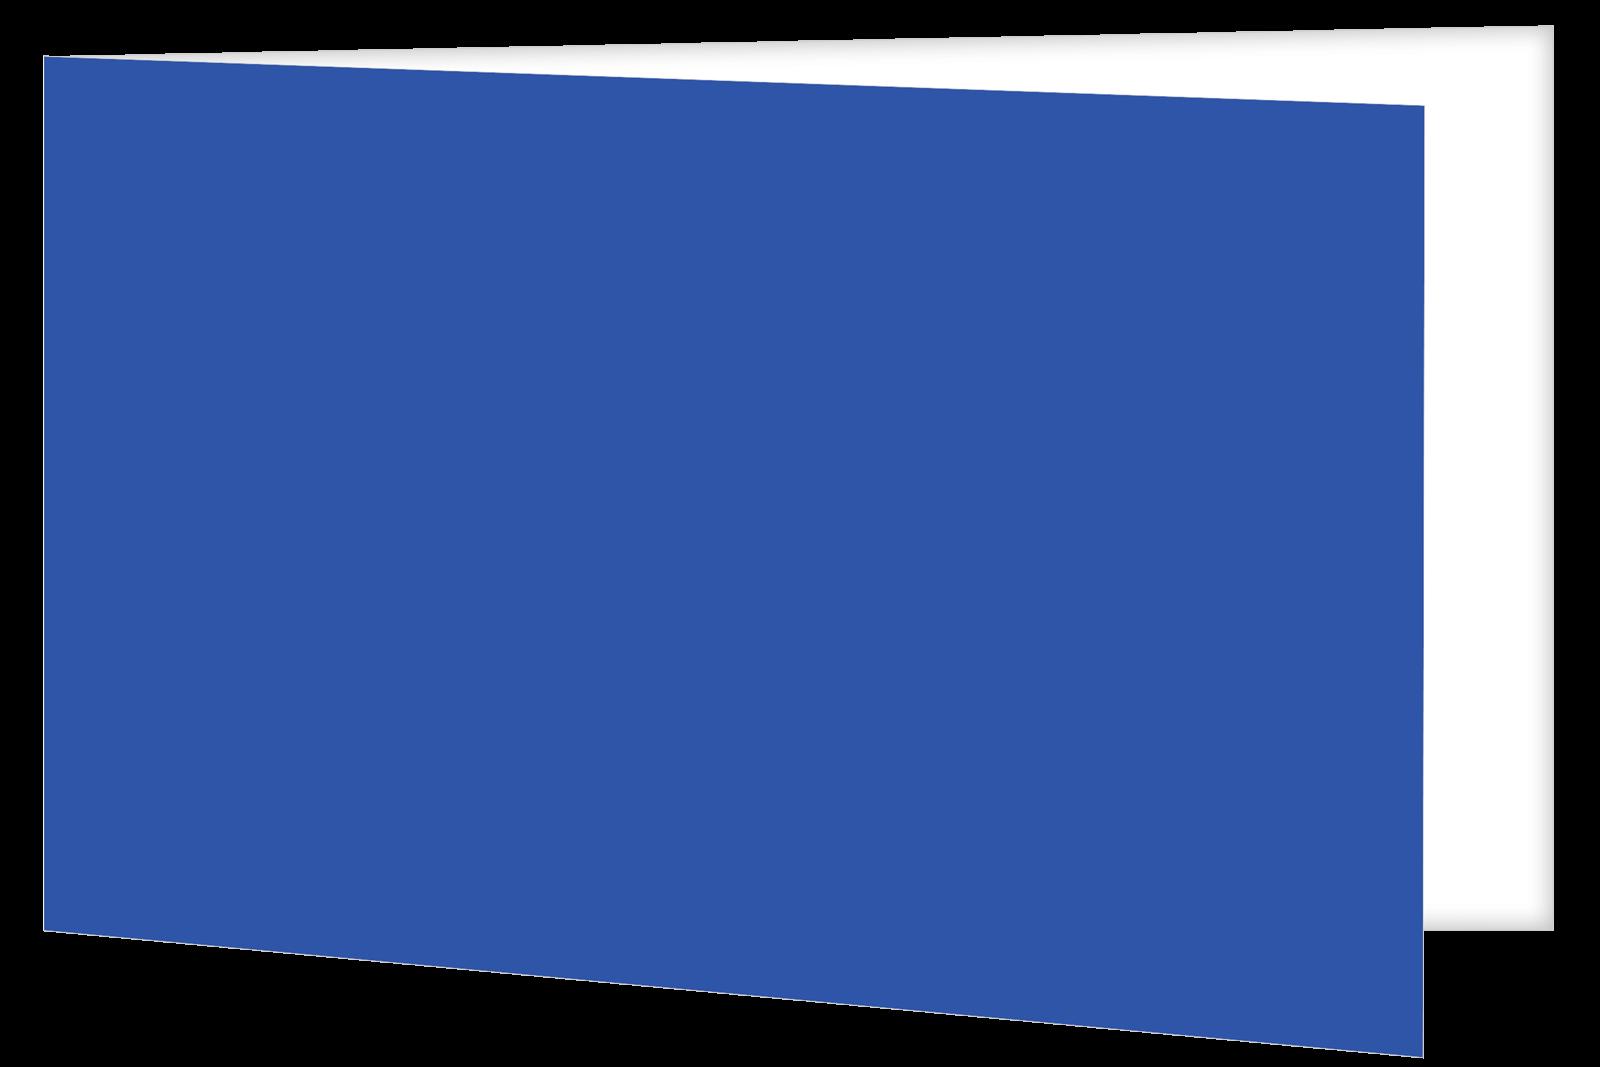 Einlegeblatt 832